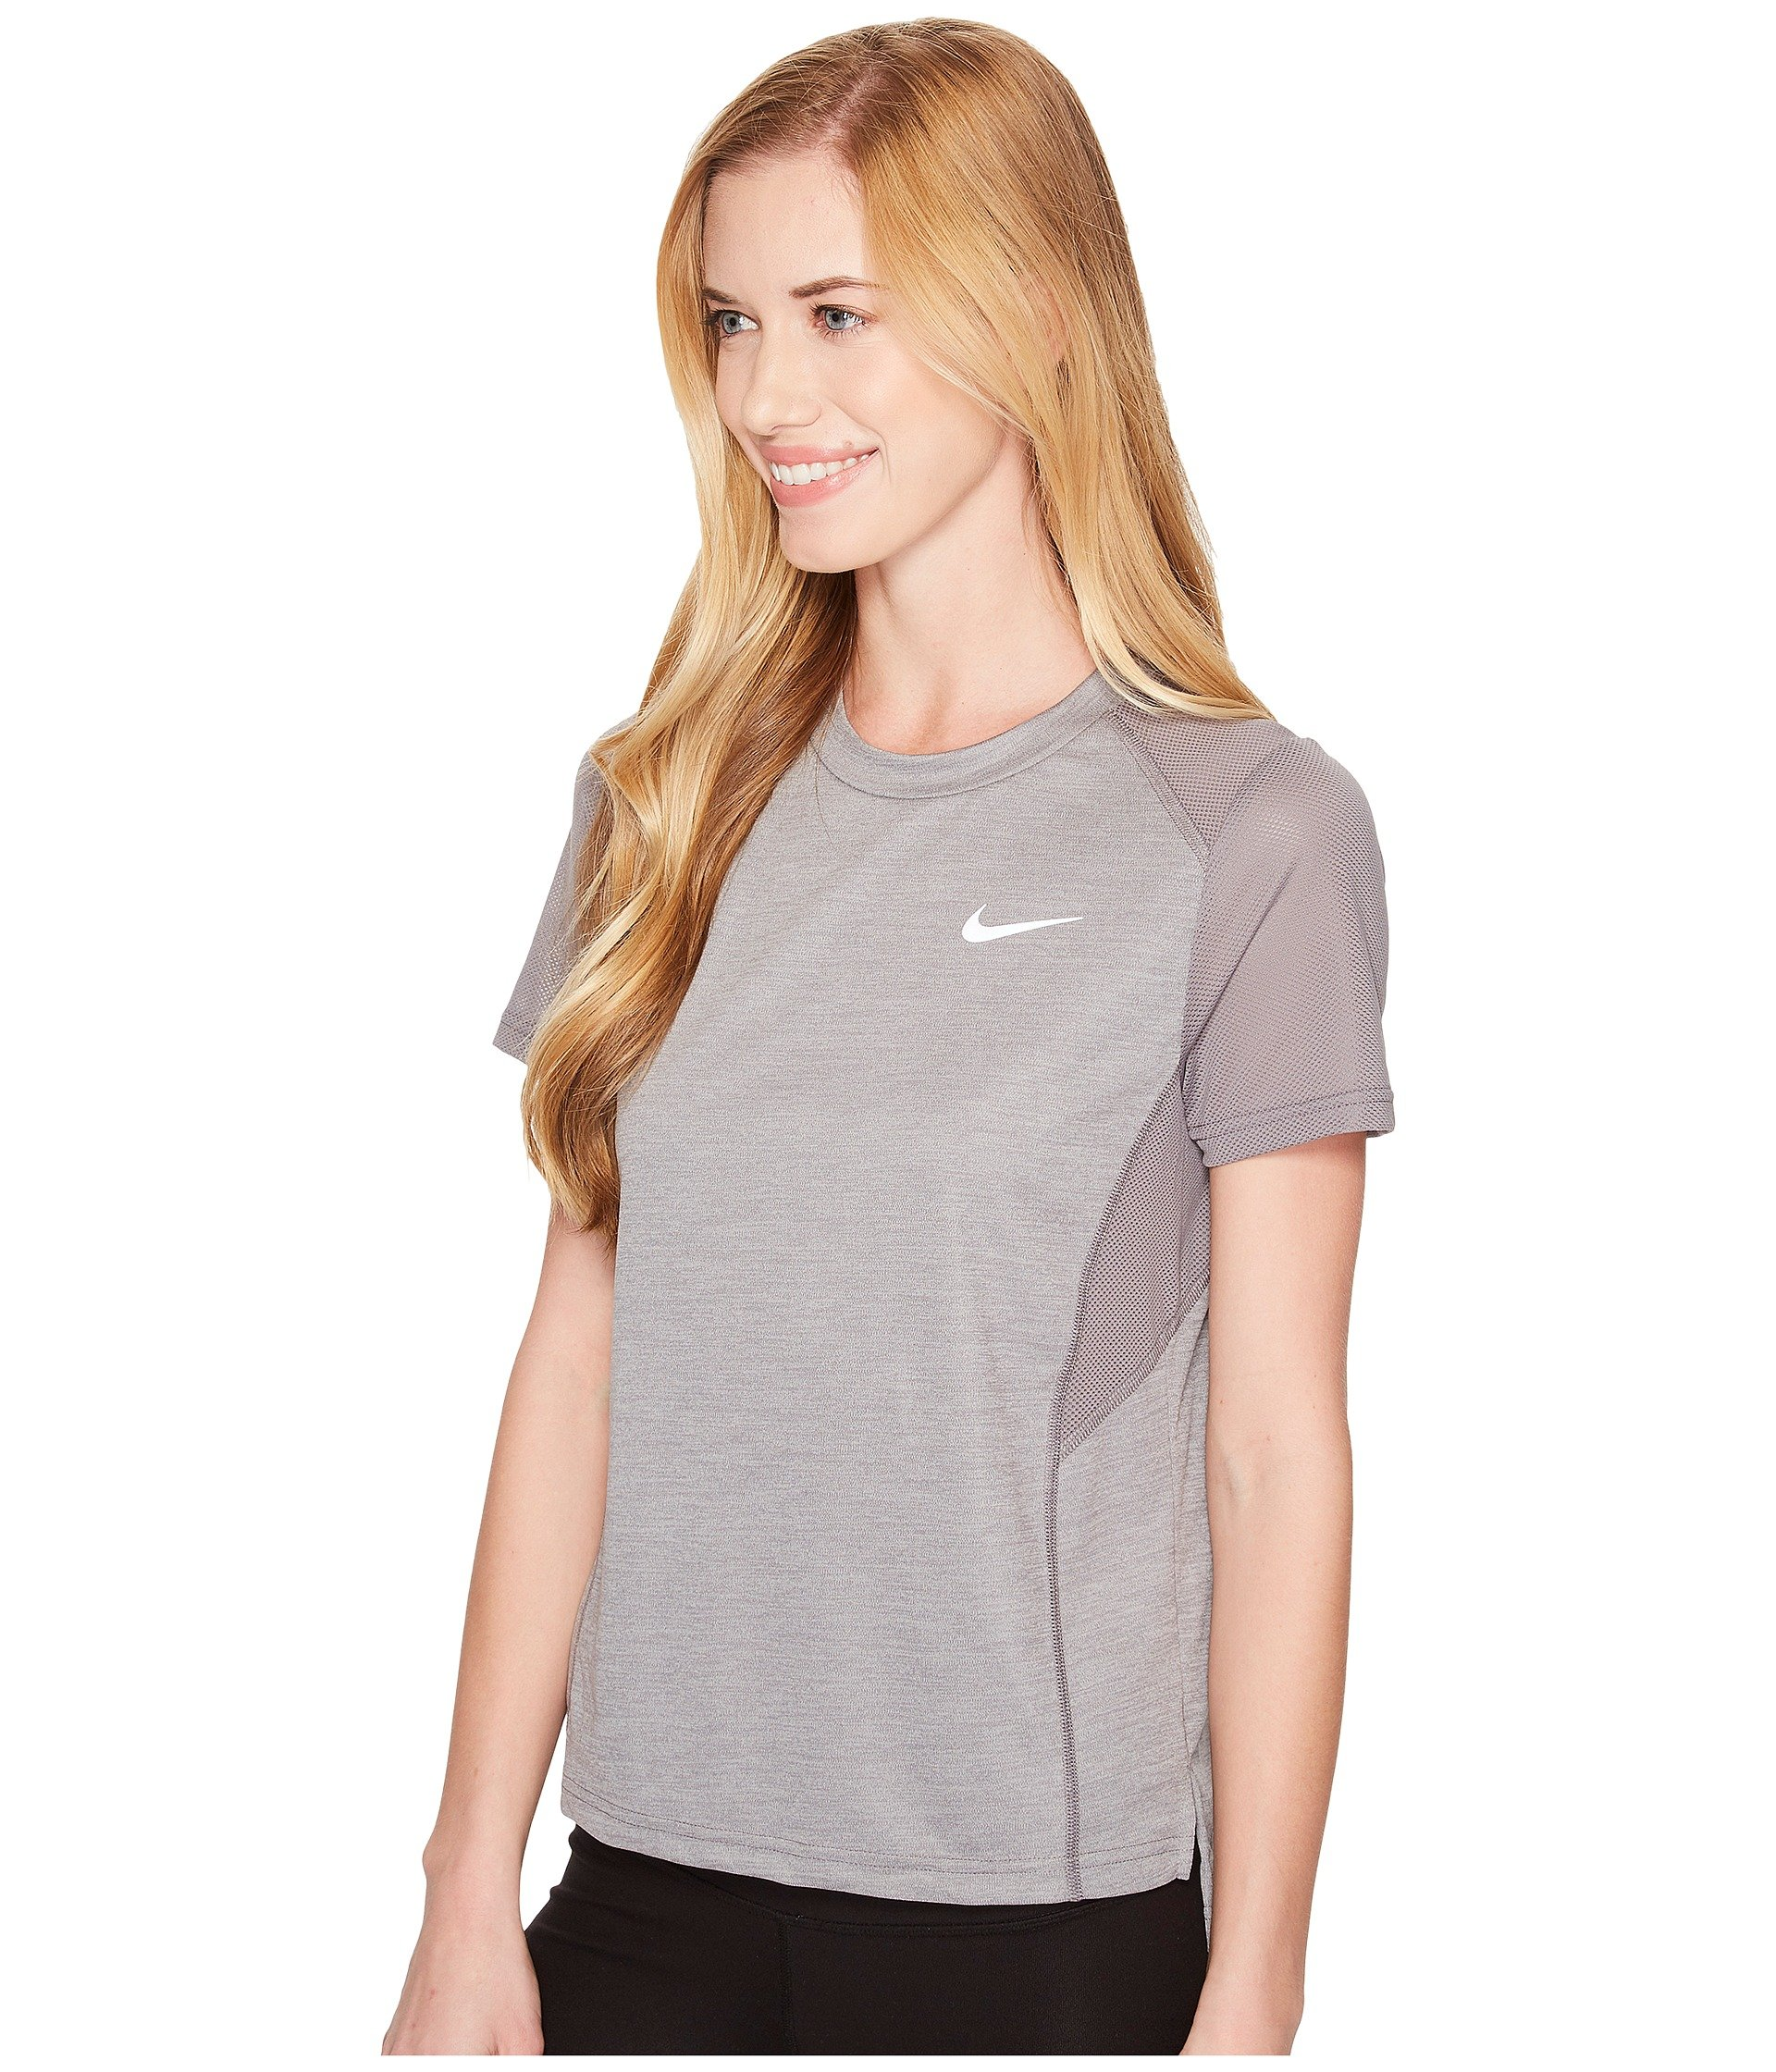 Miler heather Short Dry Gunsmoke Top Running Nike sleeve vCq0wF5